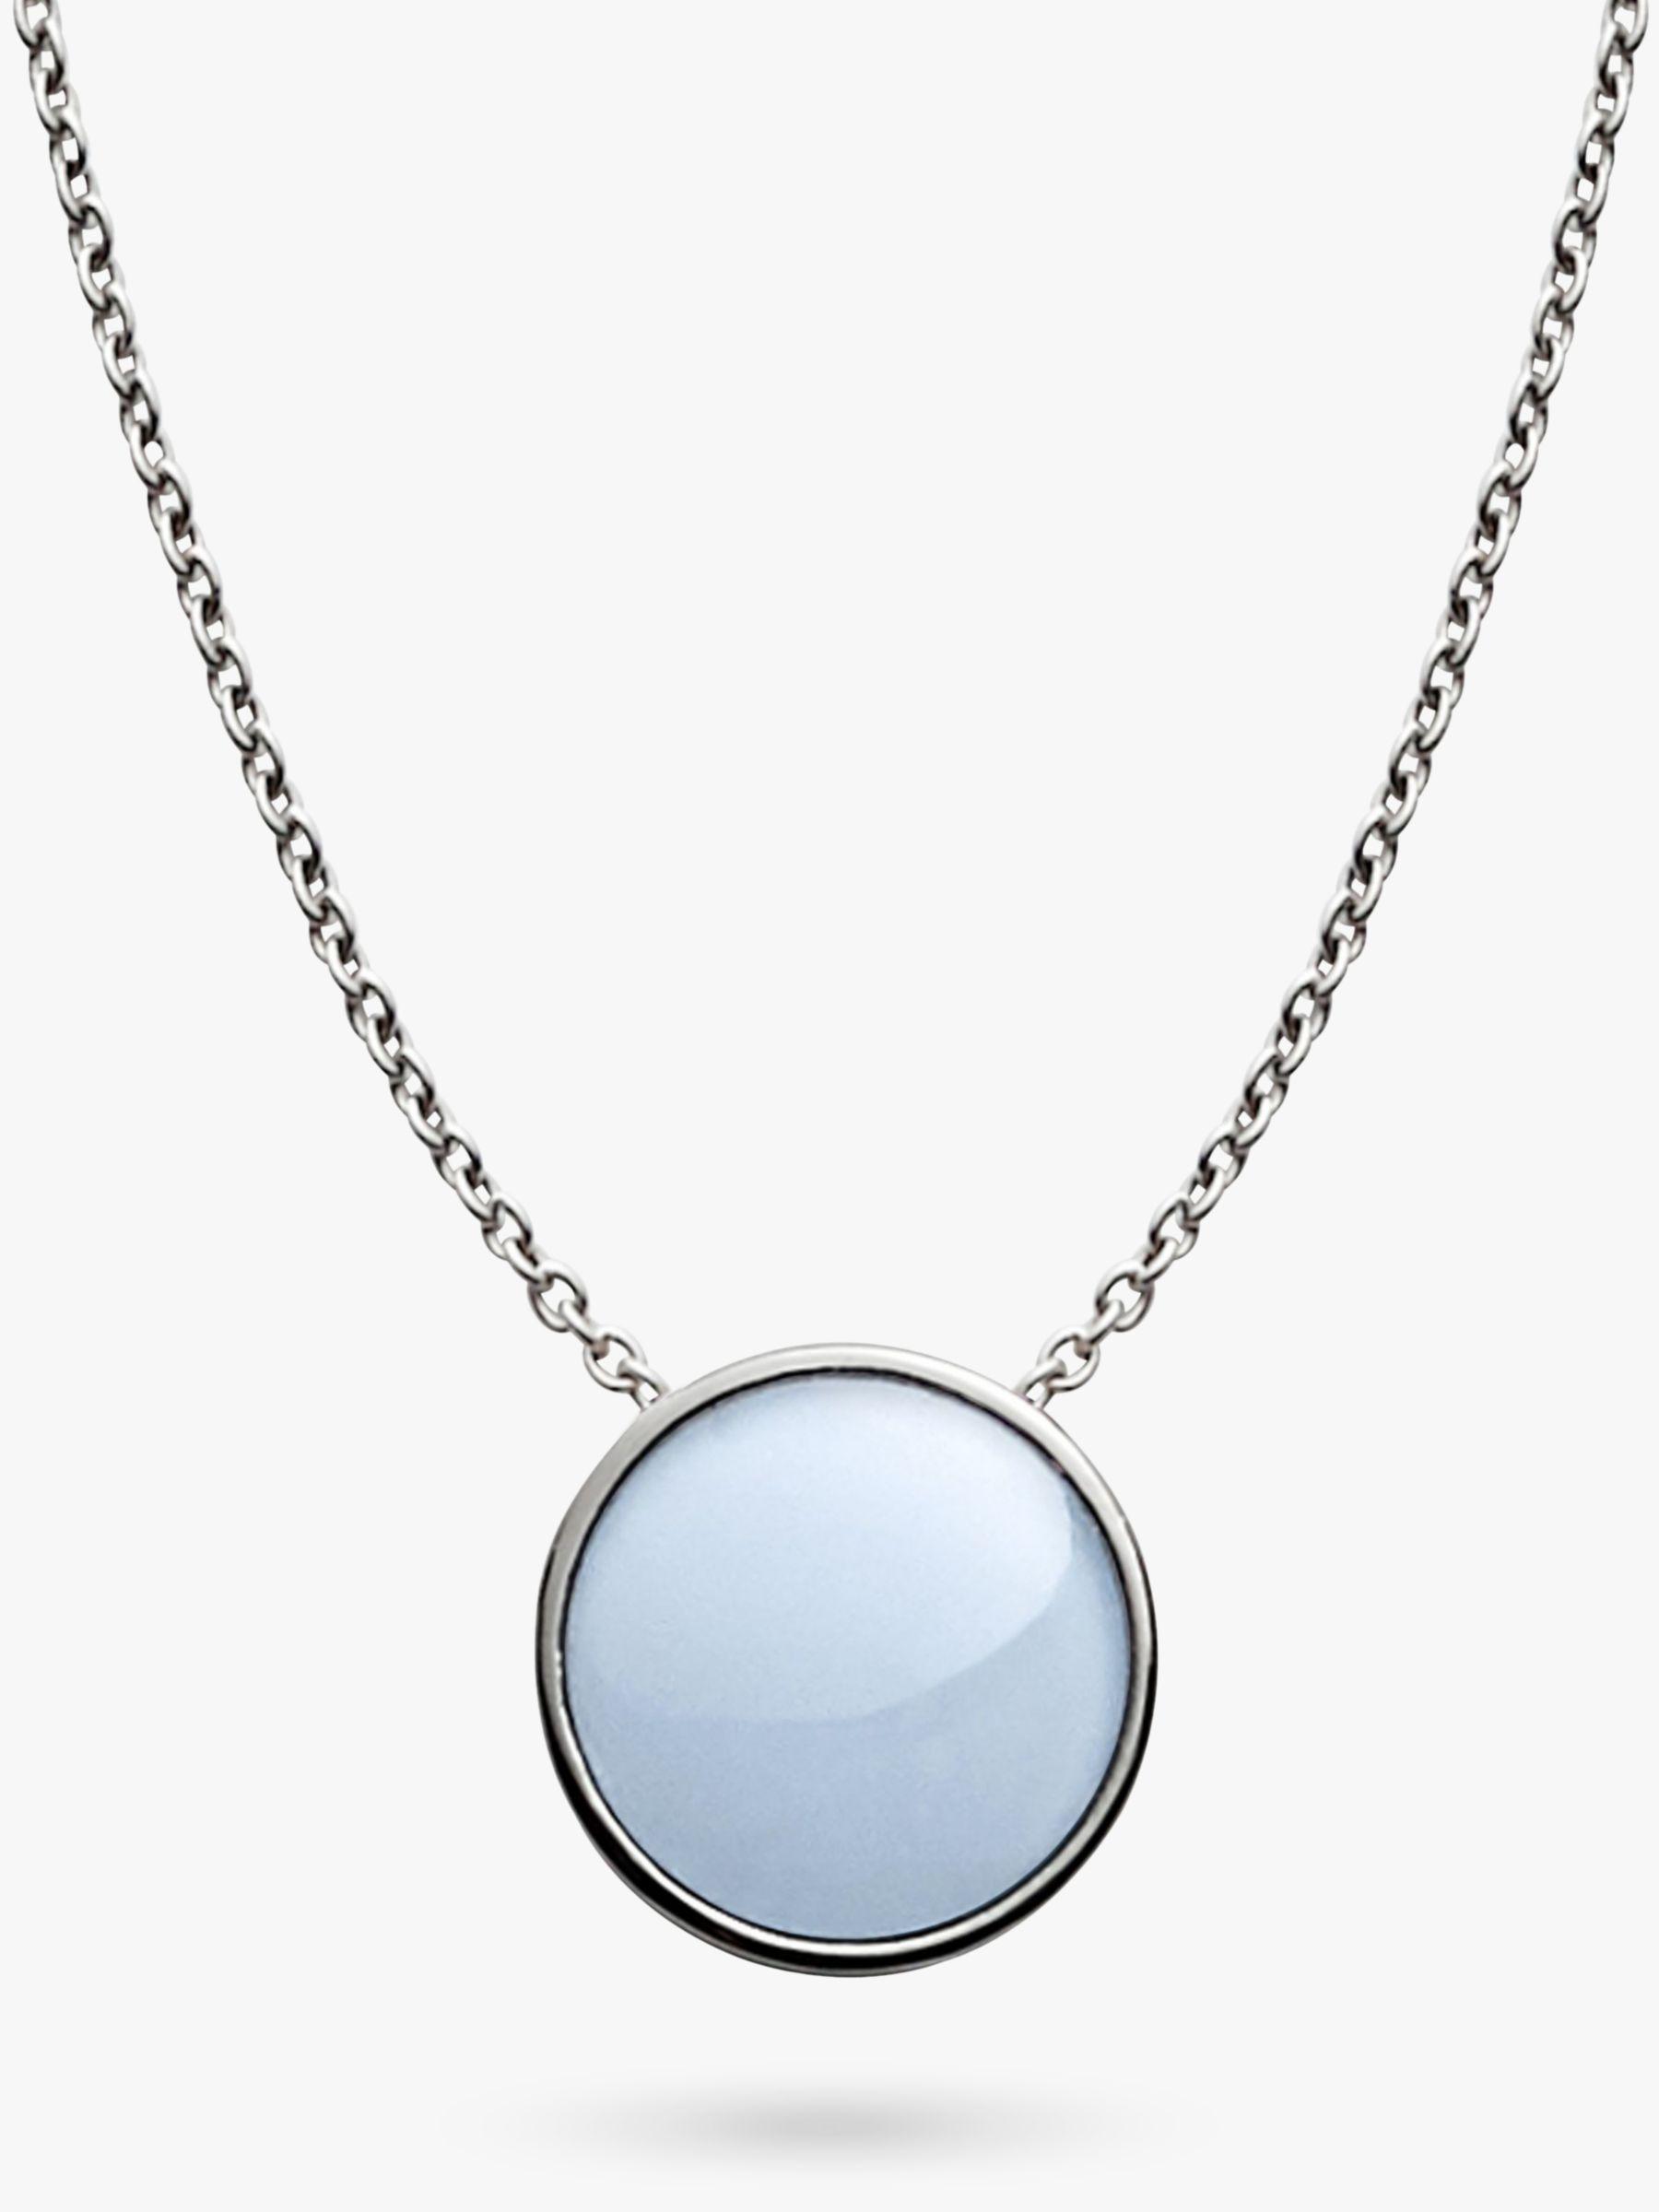 skagen Skagen Sea Glass Round Pendant Necklace, Silver/Pale Blue SKJ0790040